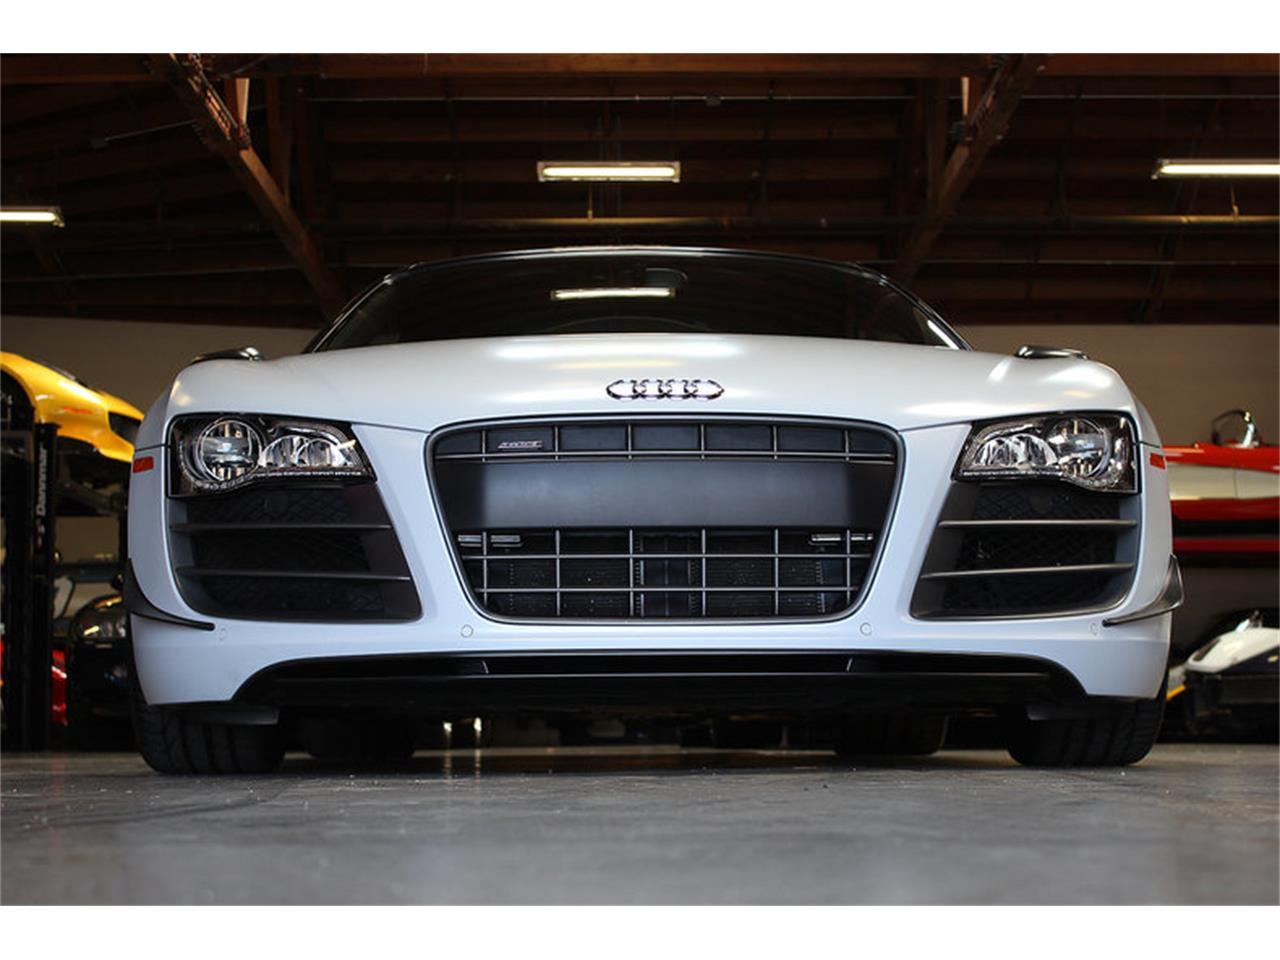 2012 Audi R8 Spyder GT for Sale   ClassicCars.com   CC-1016596